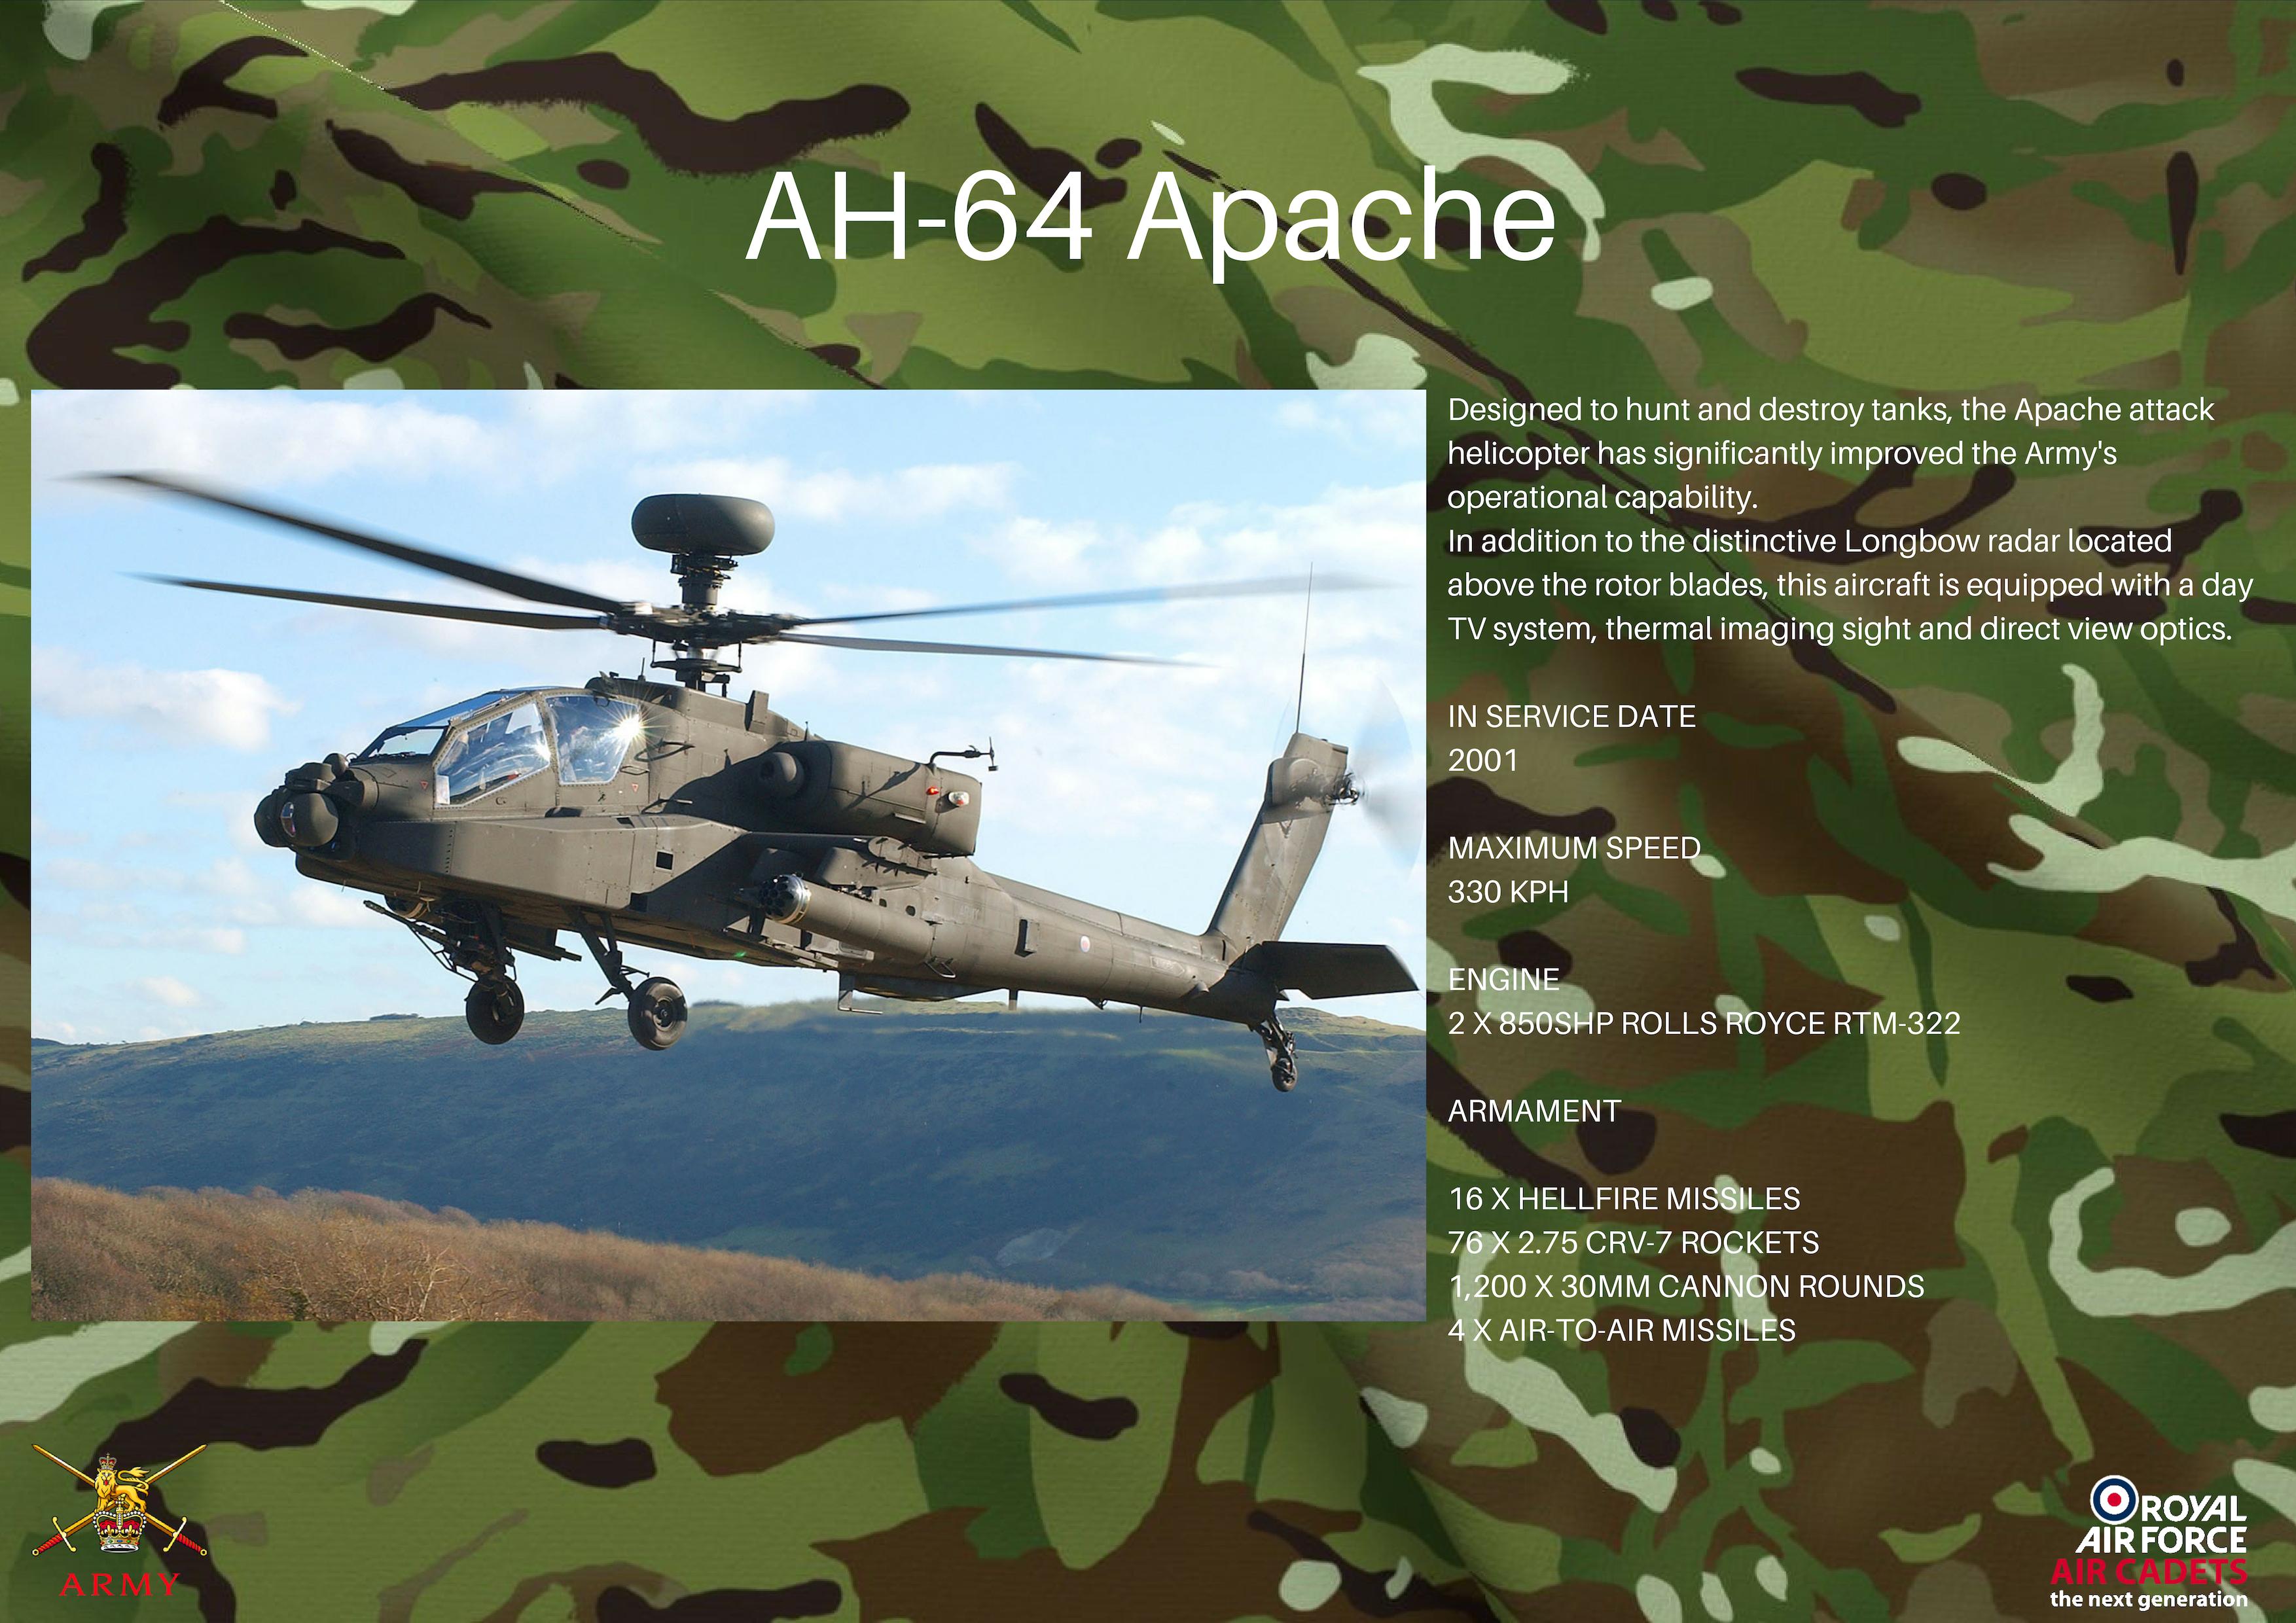 AH-64 Apache Longbow